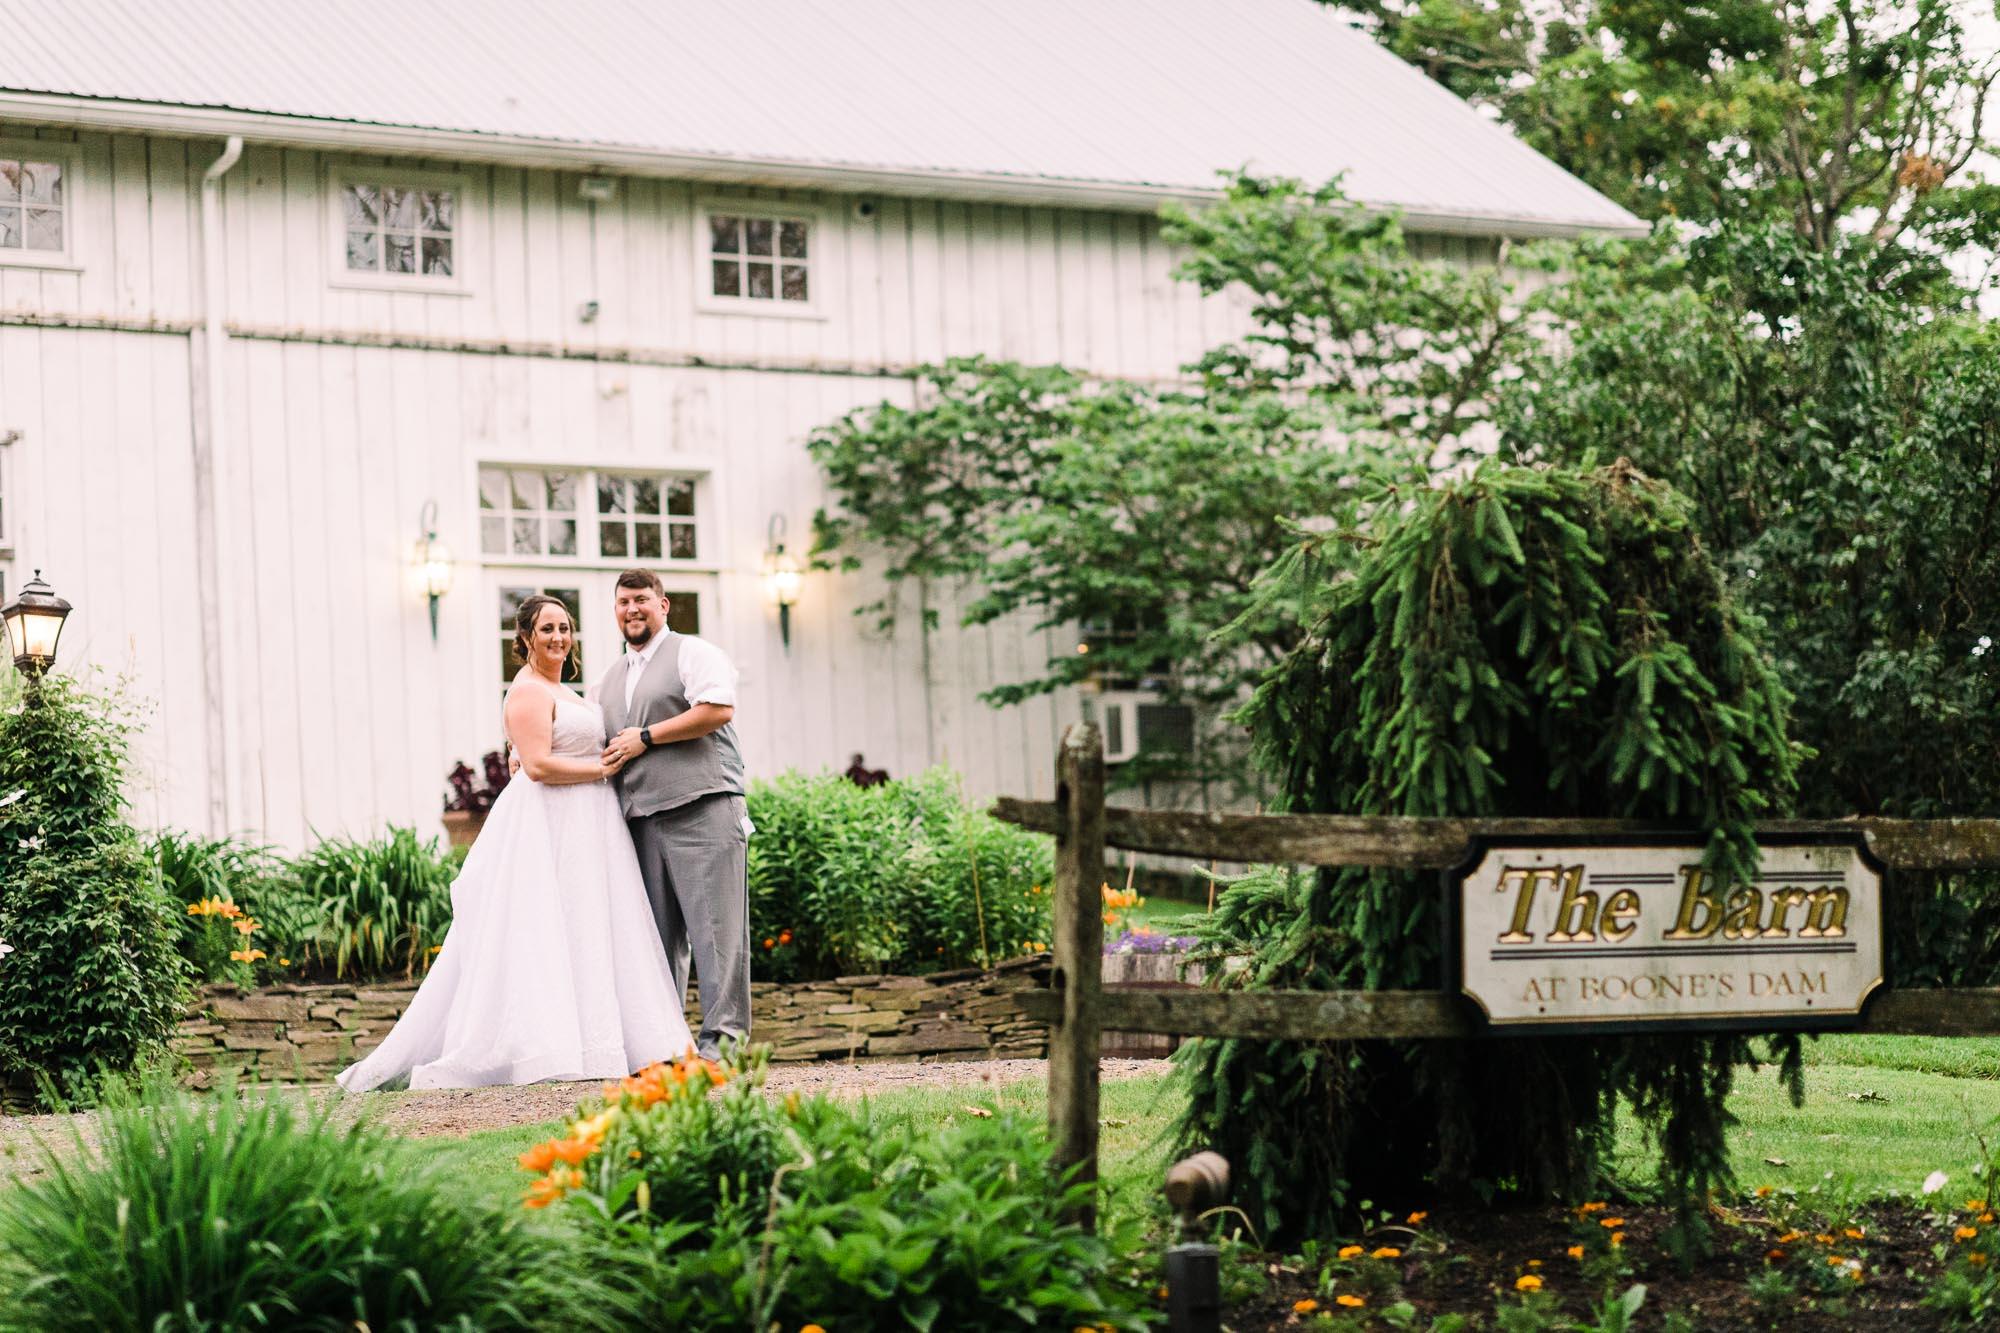 barn-at-boones-dam-wedding-5324.jpg